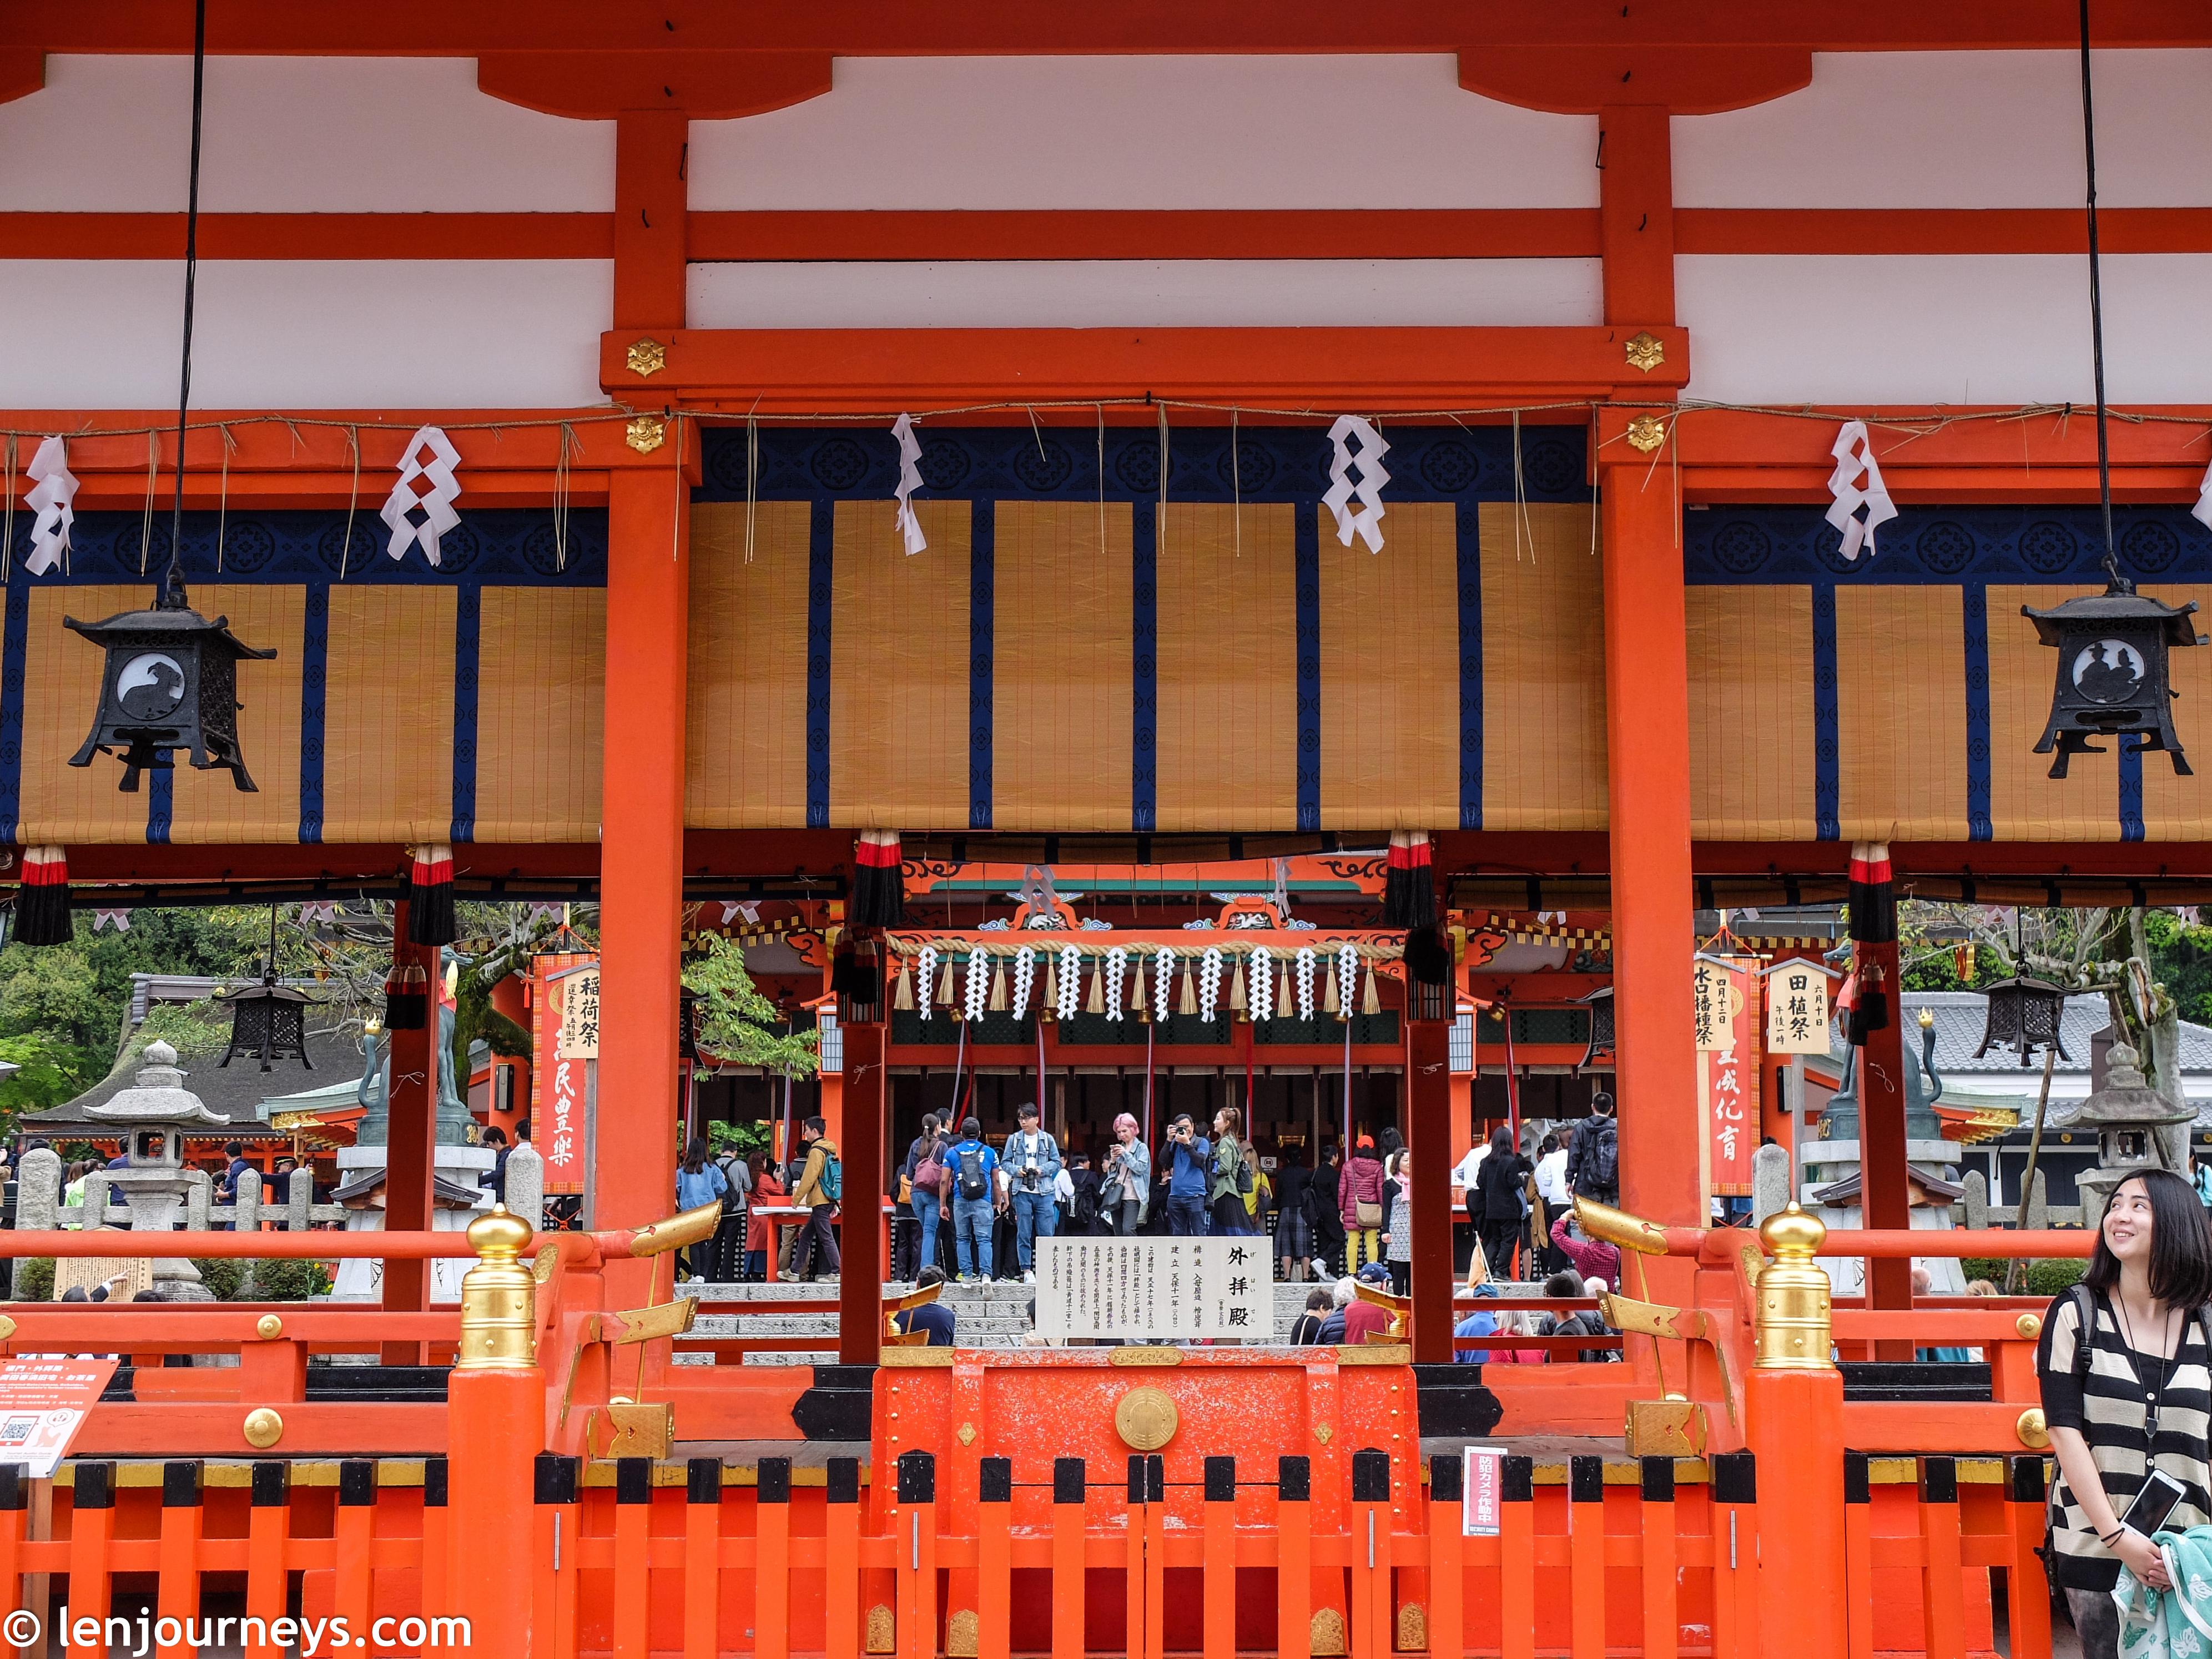 The main sanctum of Fushimi Inari